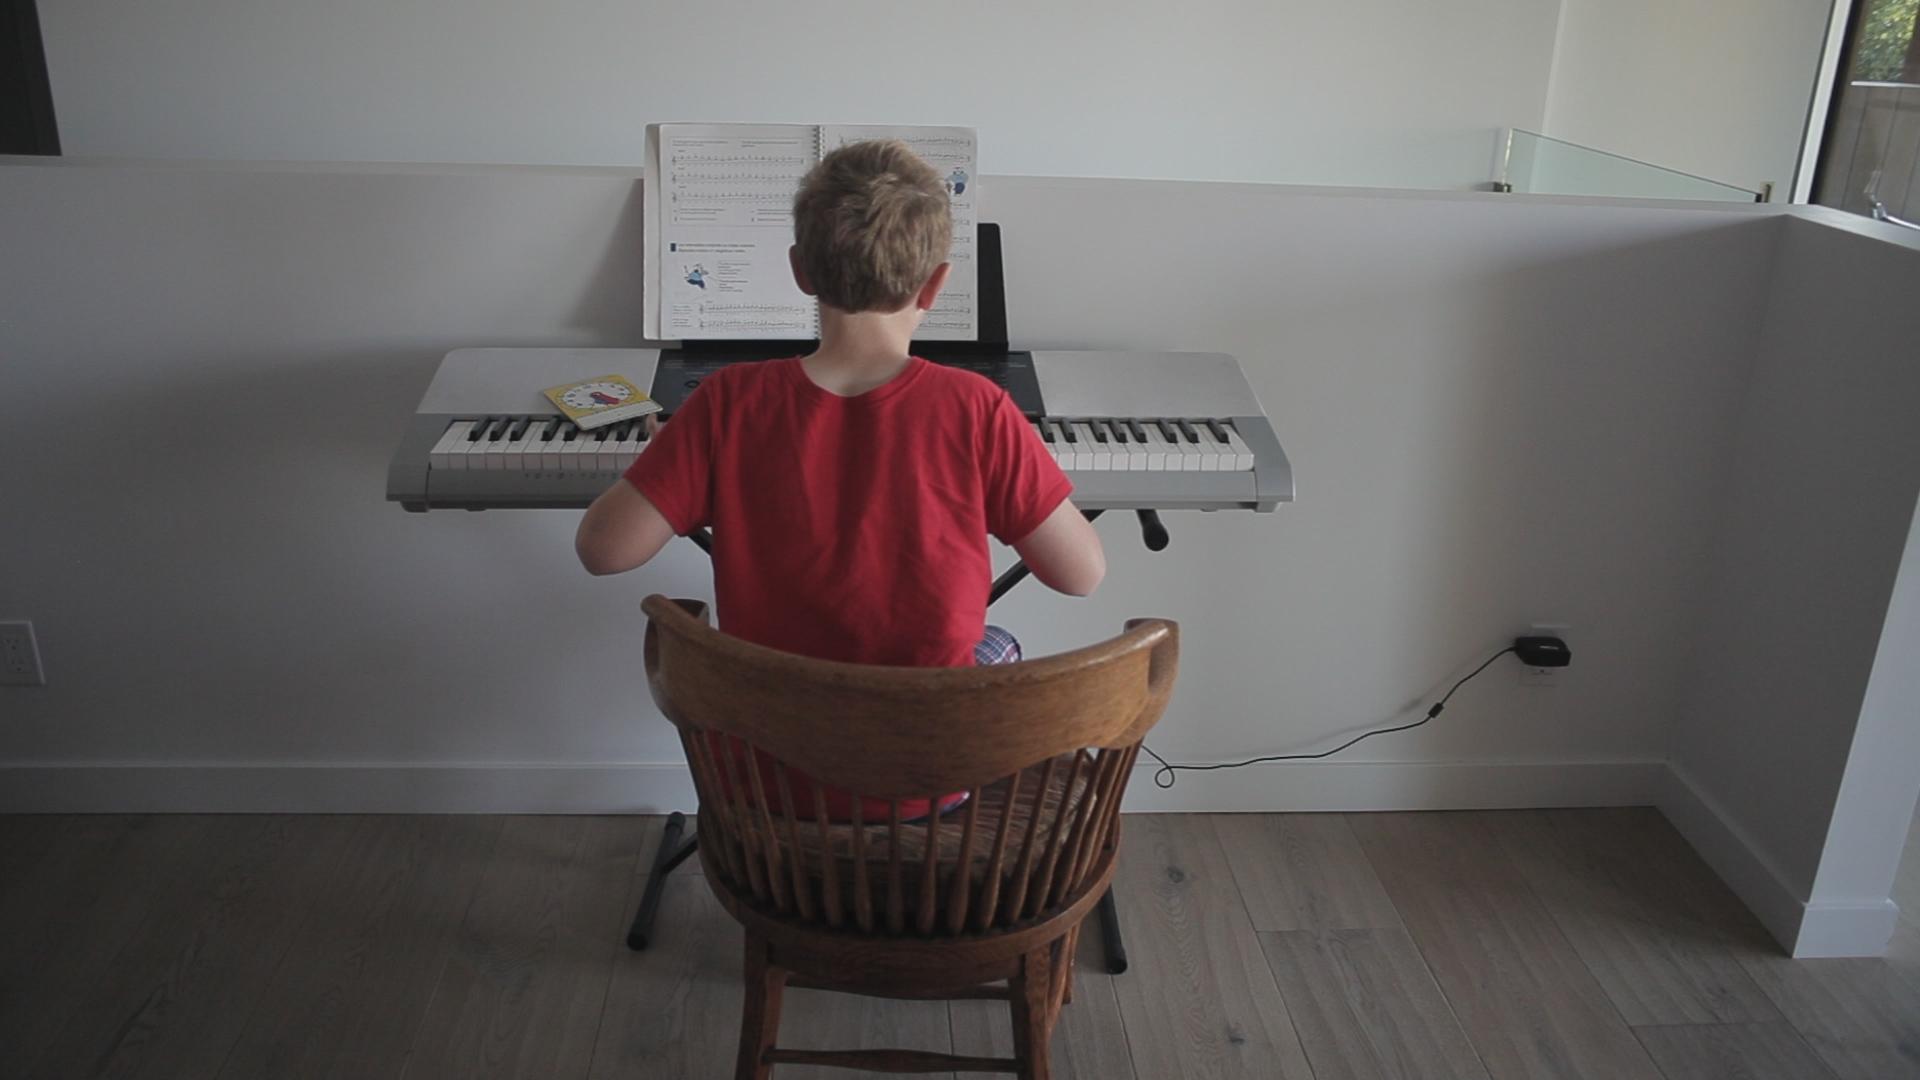 communigift-los angeles-piano-practice-woodwalk-commercial